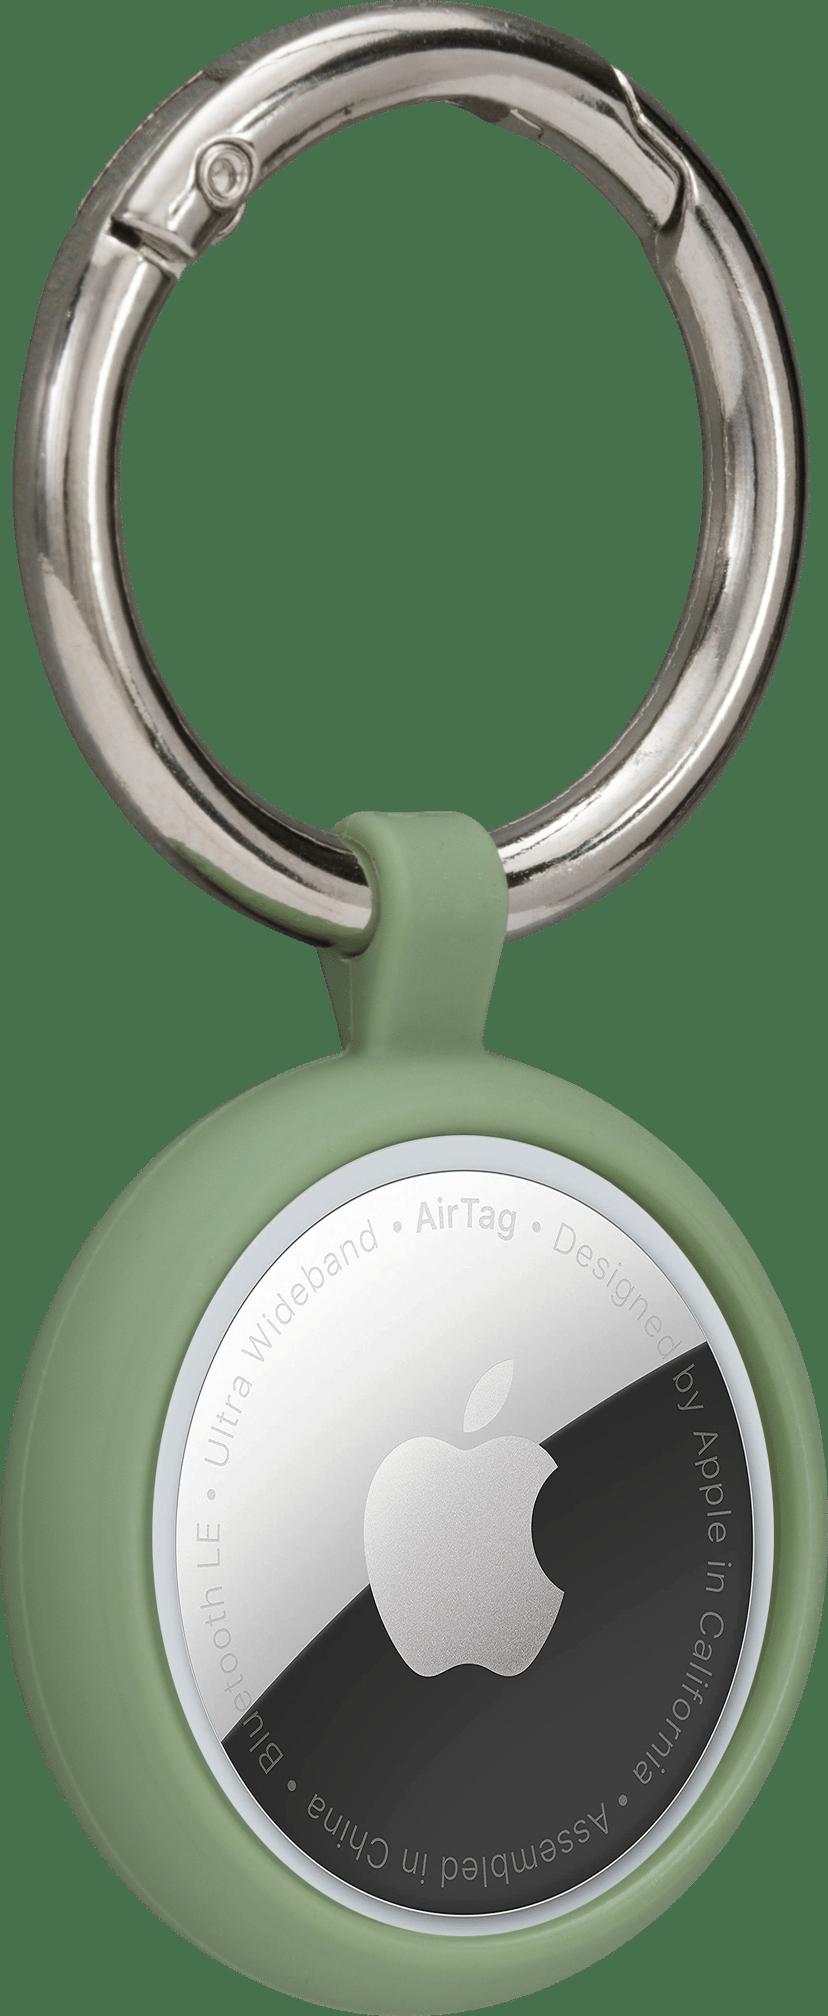 dbramante1928 Greenland Airtag Key Ring Green Bay